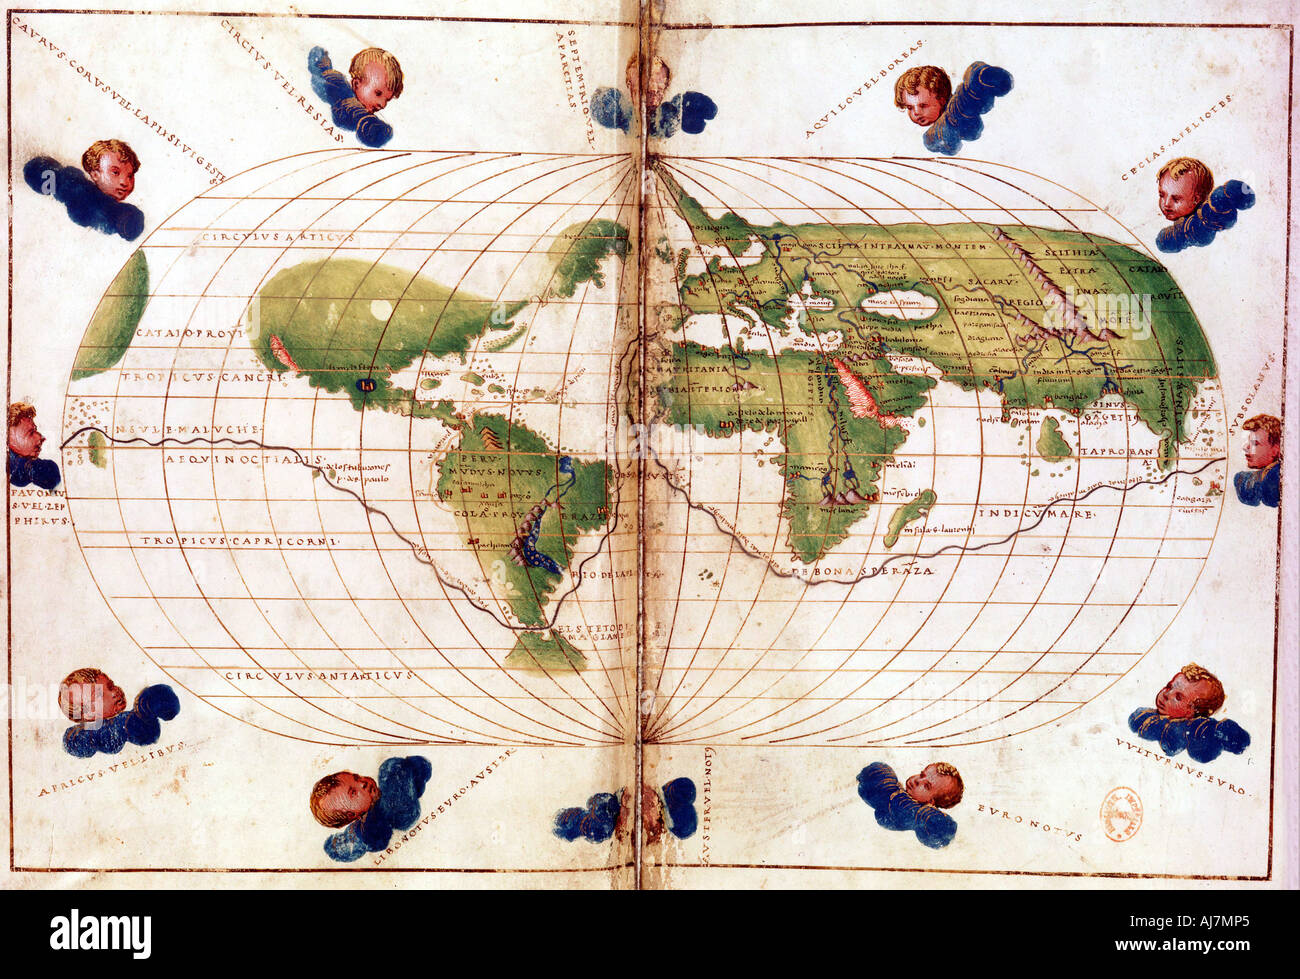 Map of Magellan s round the world voyage 1519 1521  - Stock Image